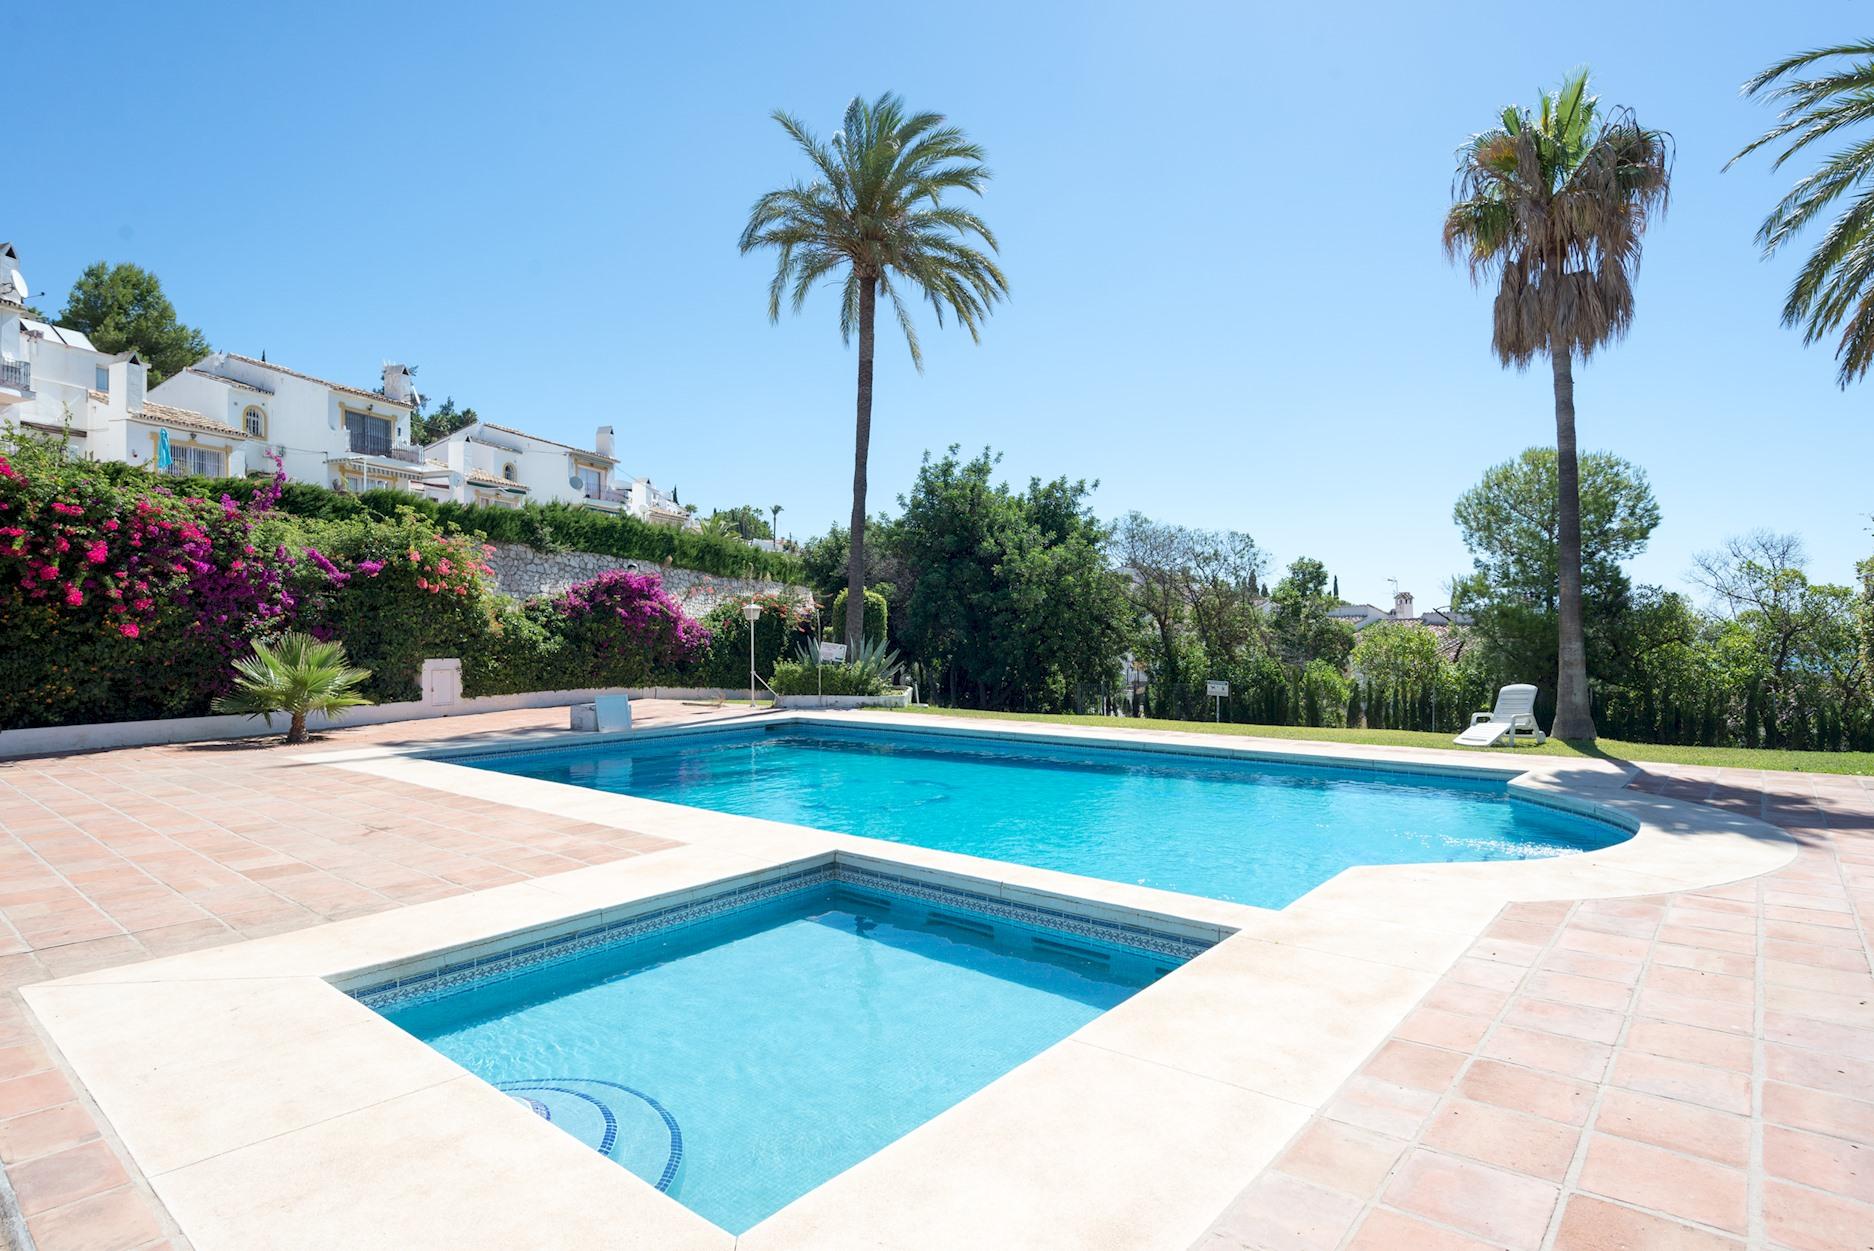 Apartment MalagaSuite House Pool photo 20515258